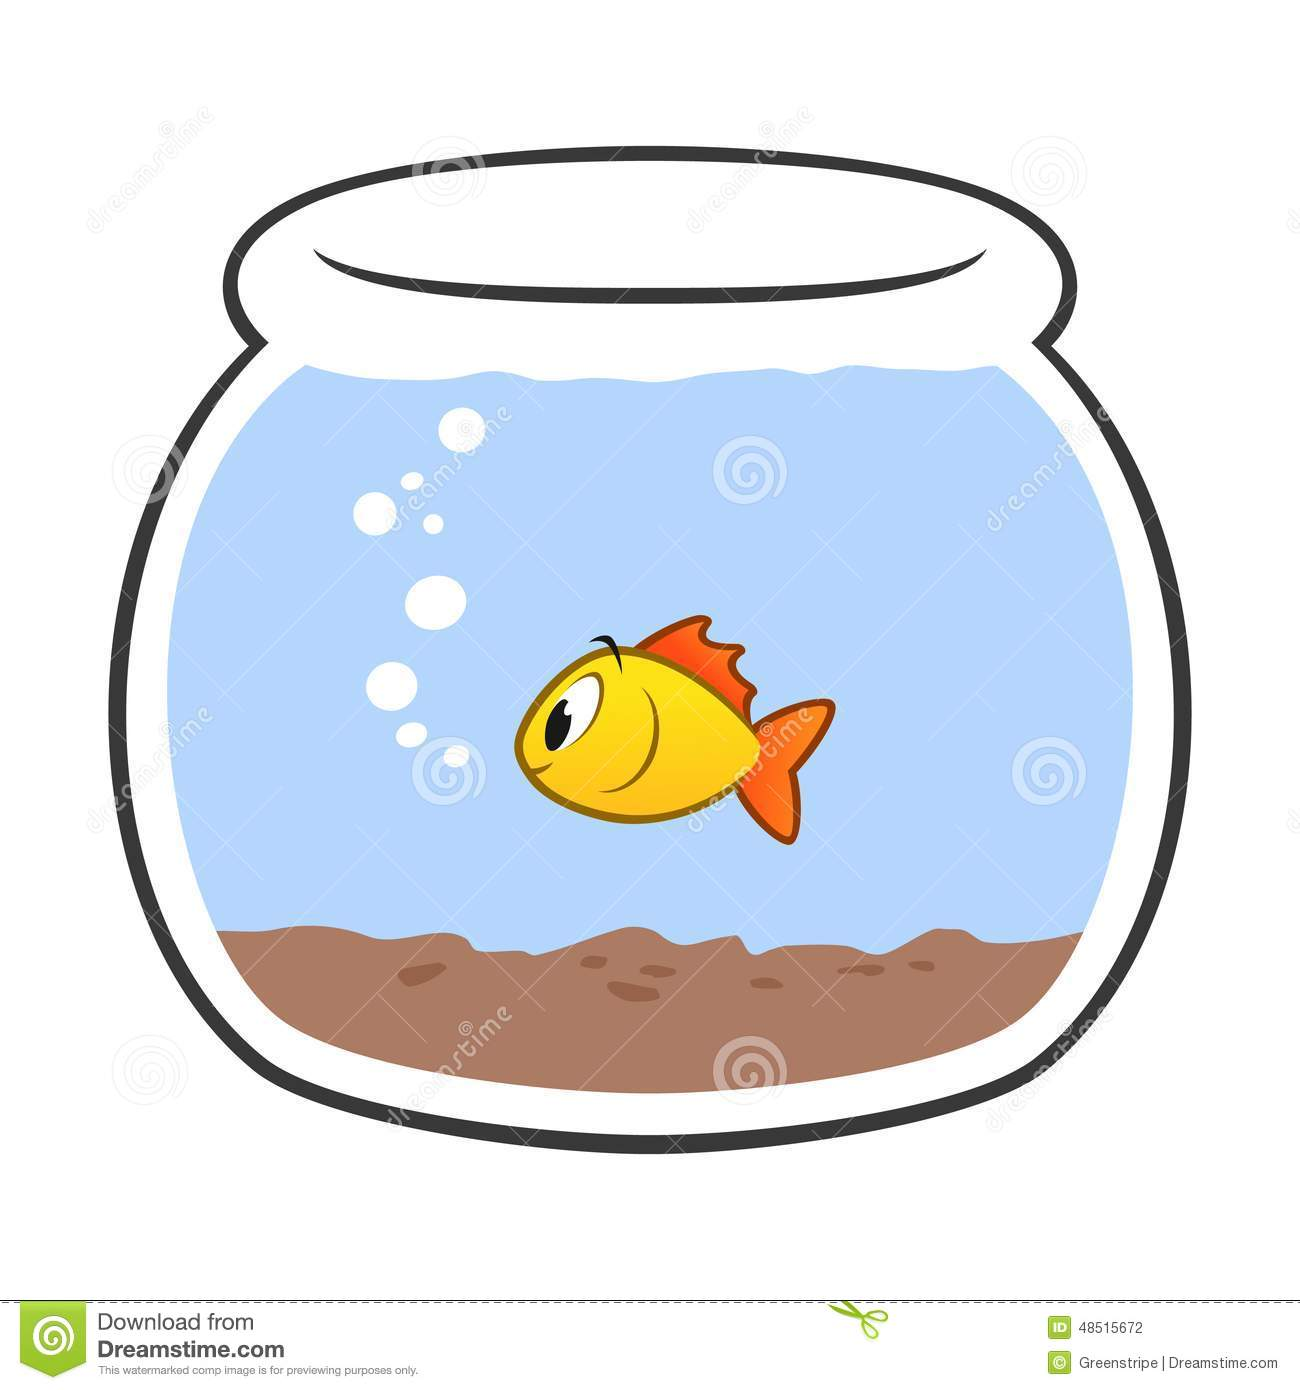 Aquarium clipart goldfish bowl. Fish tank free download